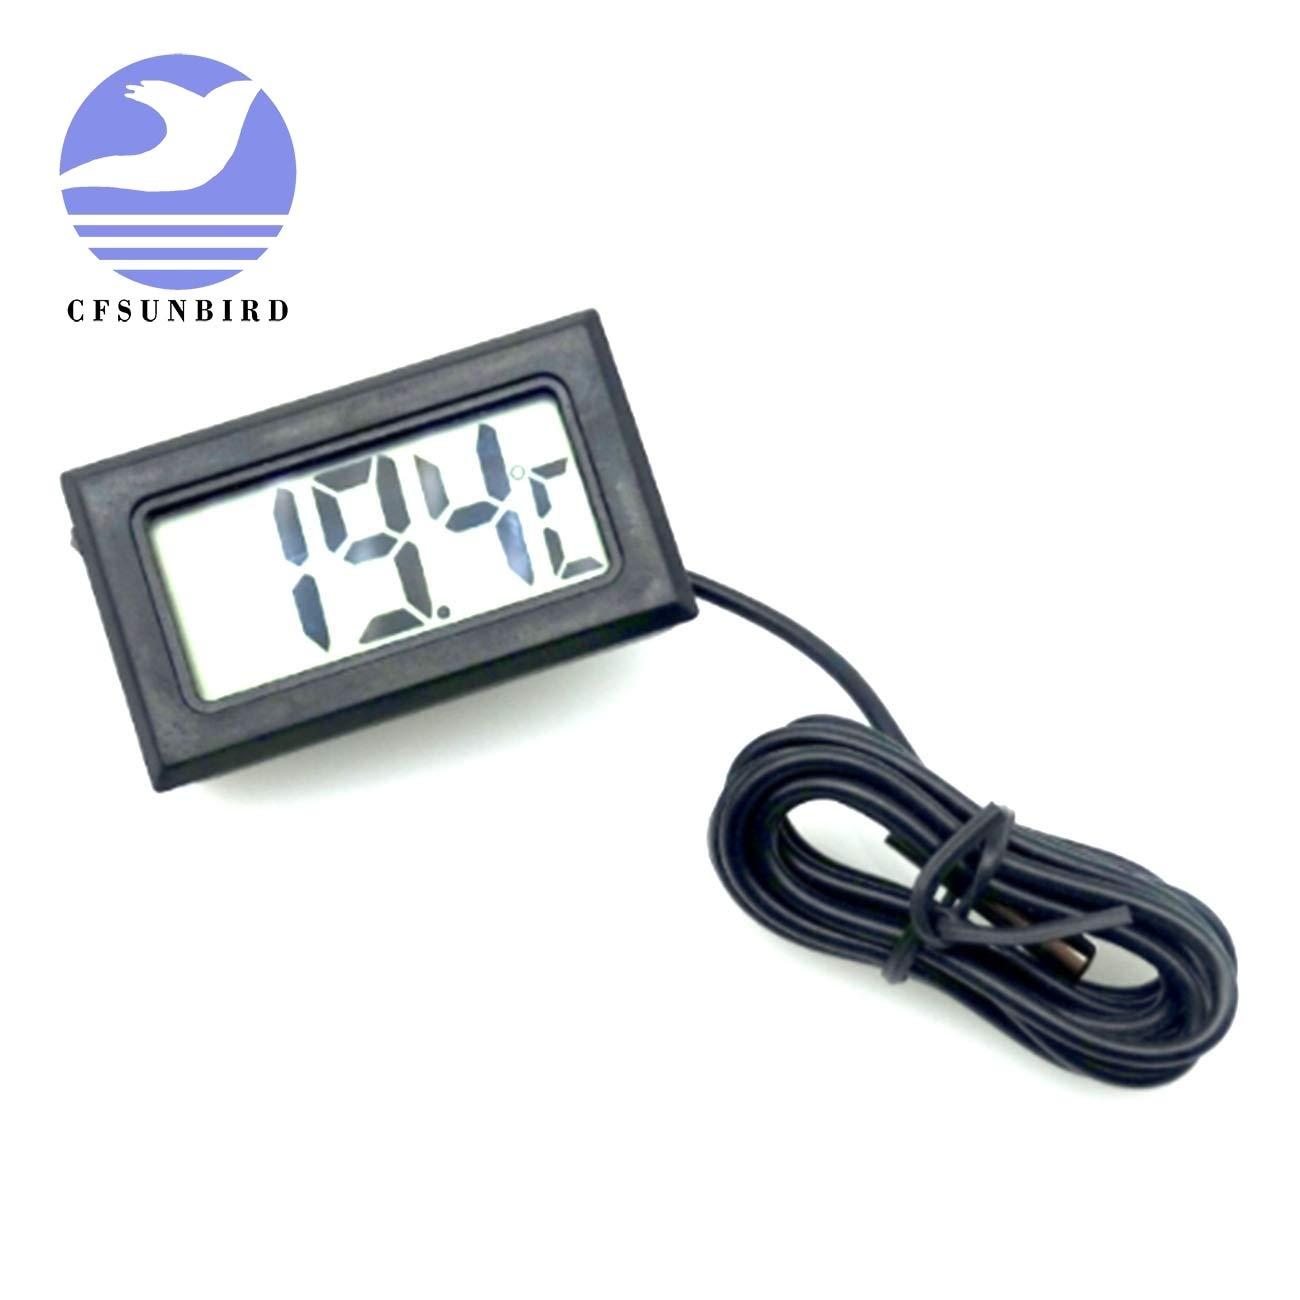 Batcus CFsunbird Digital LCD Probe Fridge Freezer Thermometer Thermograph for Refrigerator 110C Black White